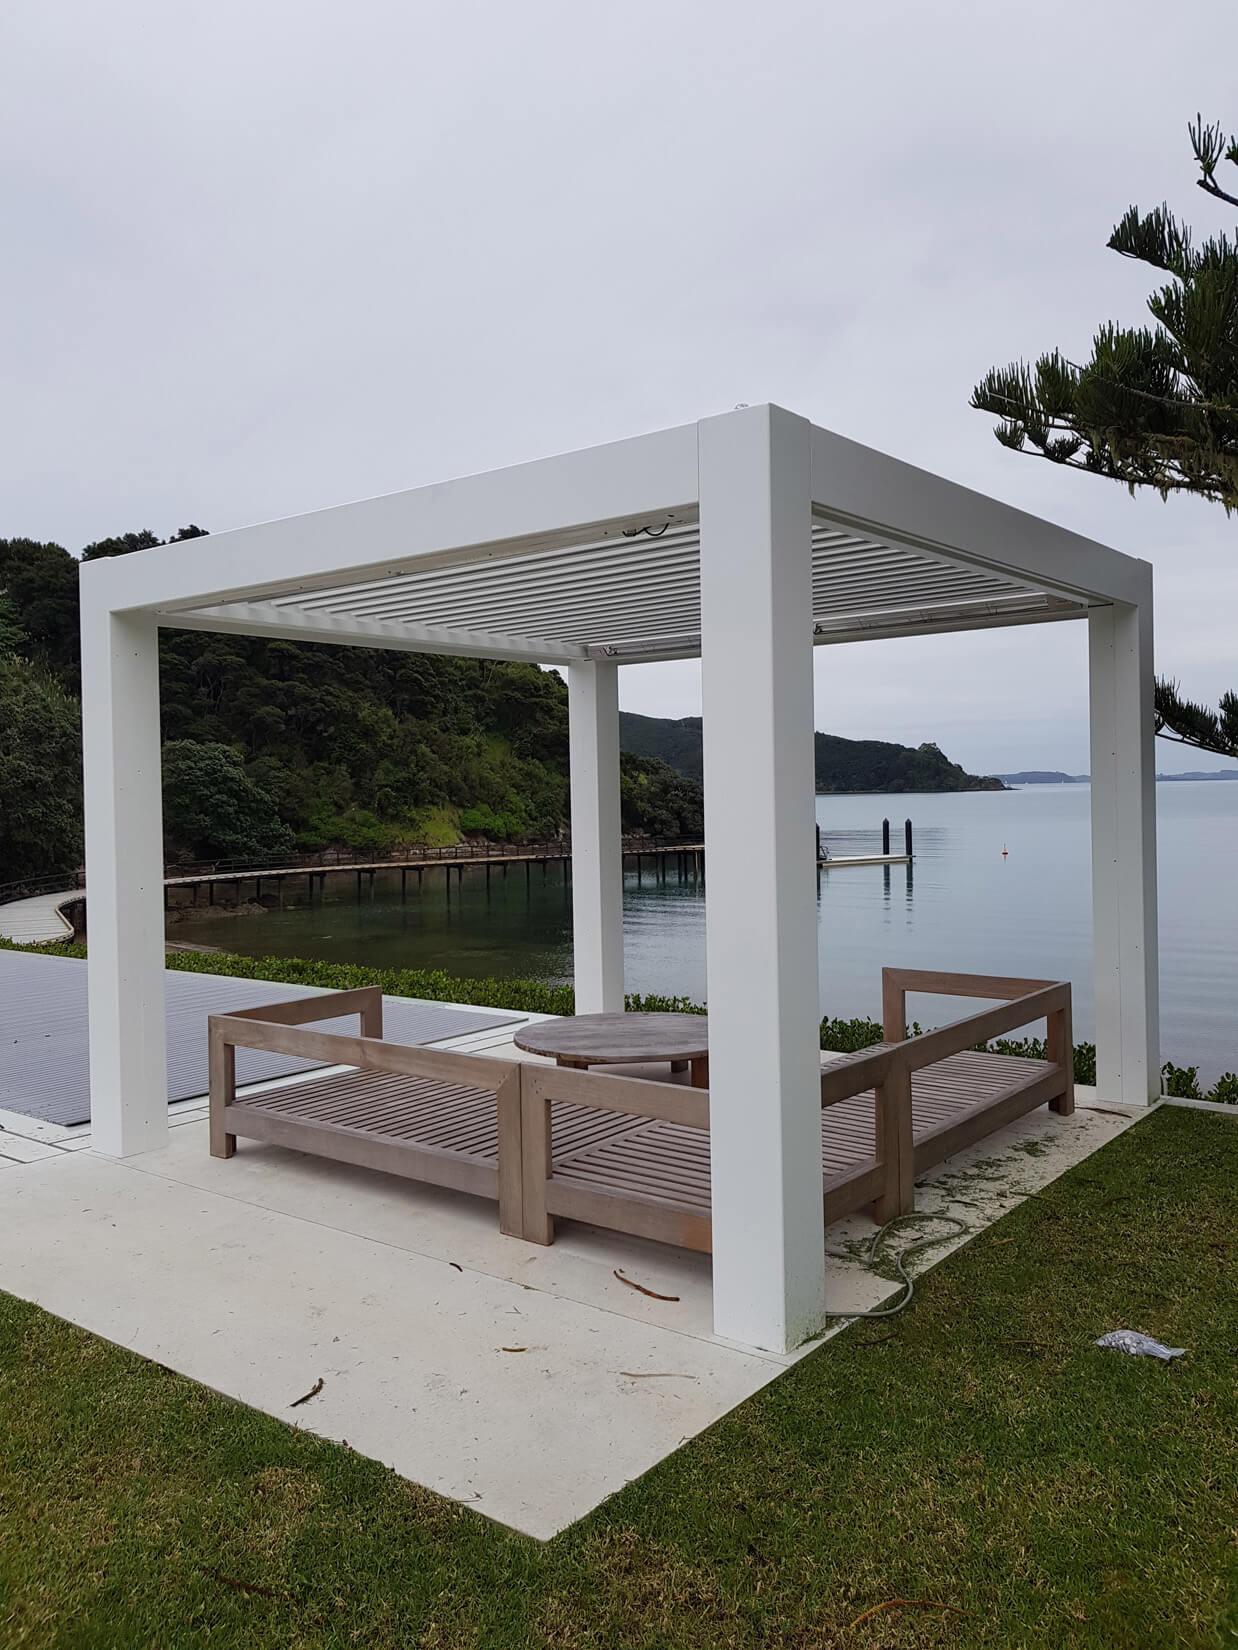 Paroa Bay project - gallery image 2